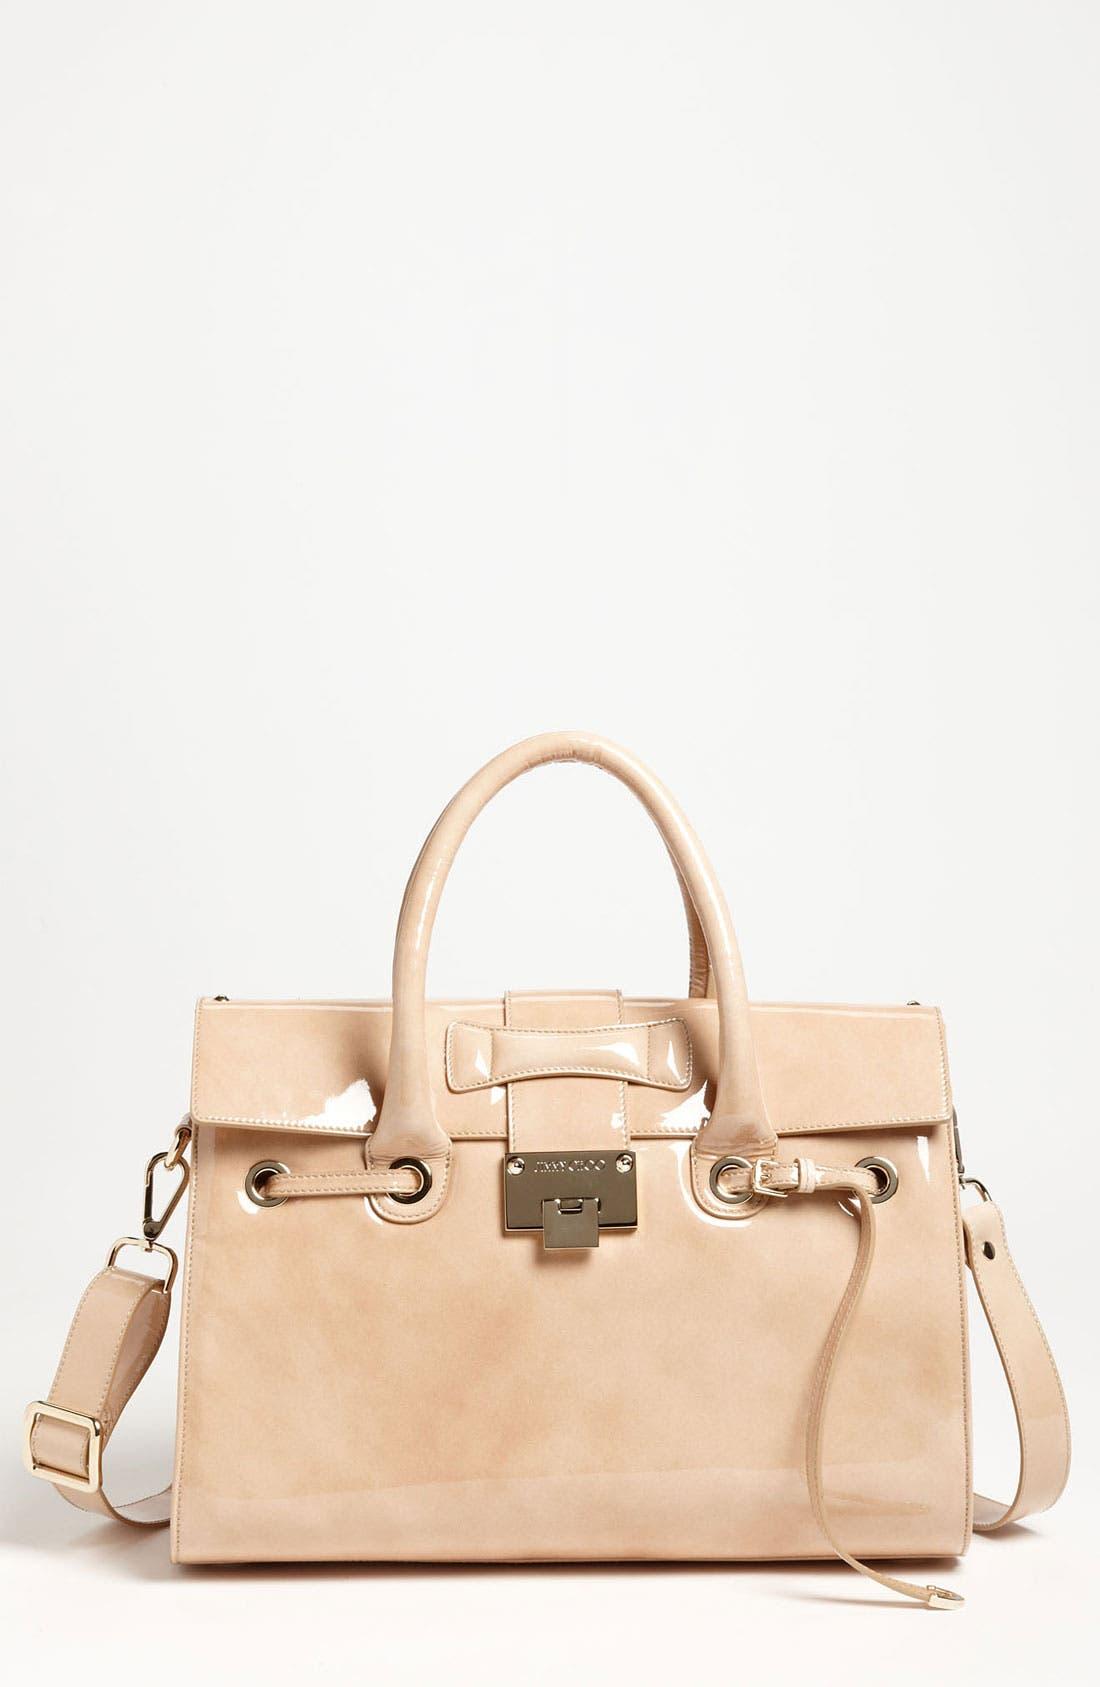 Main Image - Jimmy Choo 'Rosalie' Patent Leather Satchel